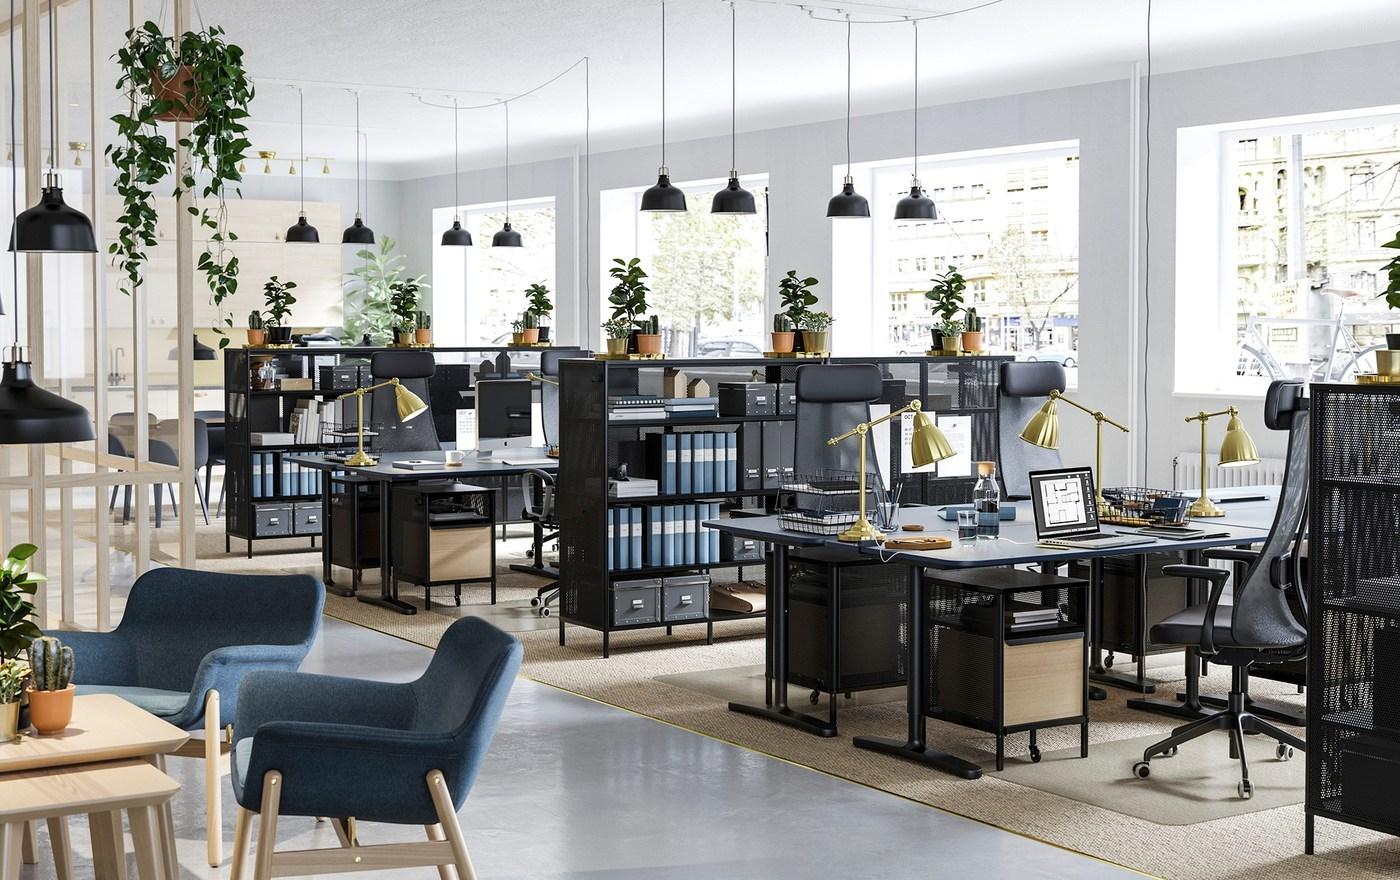 Büro Geschäft Gastronomie Inspirationen IKEA